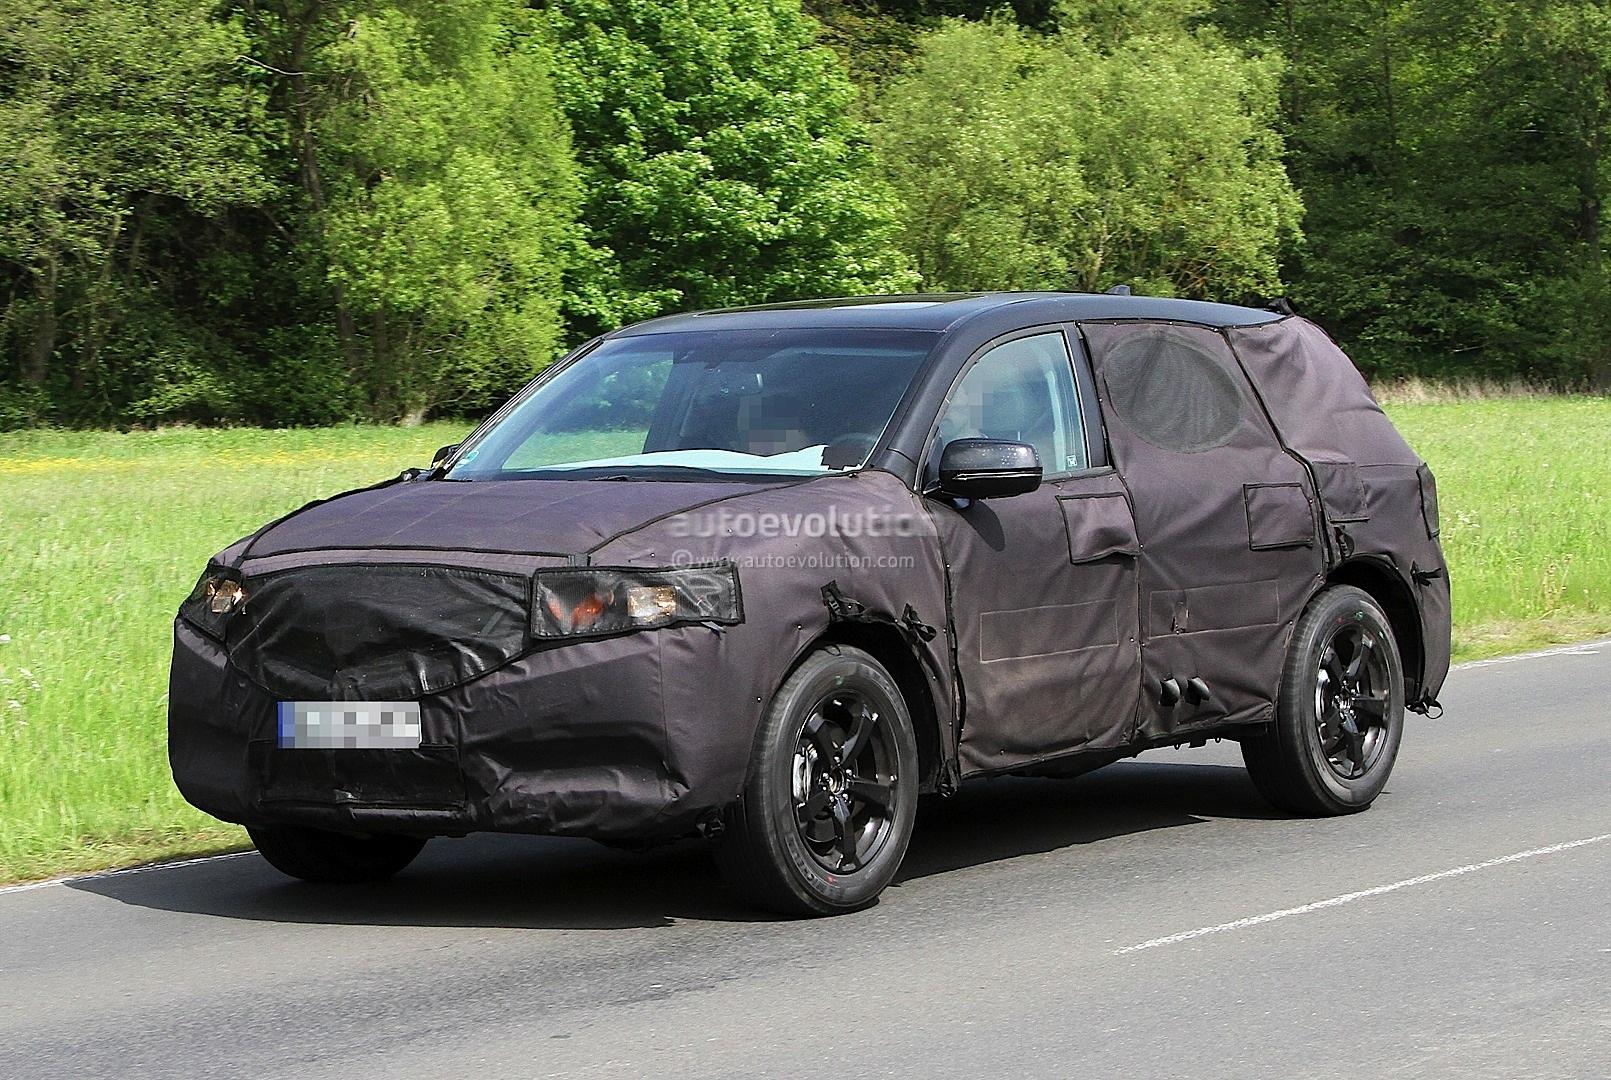 Spyshots: 2014 Acura MDX Testing in Germany